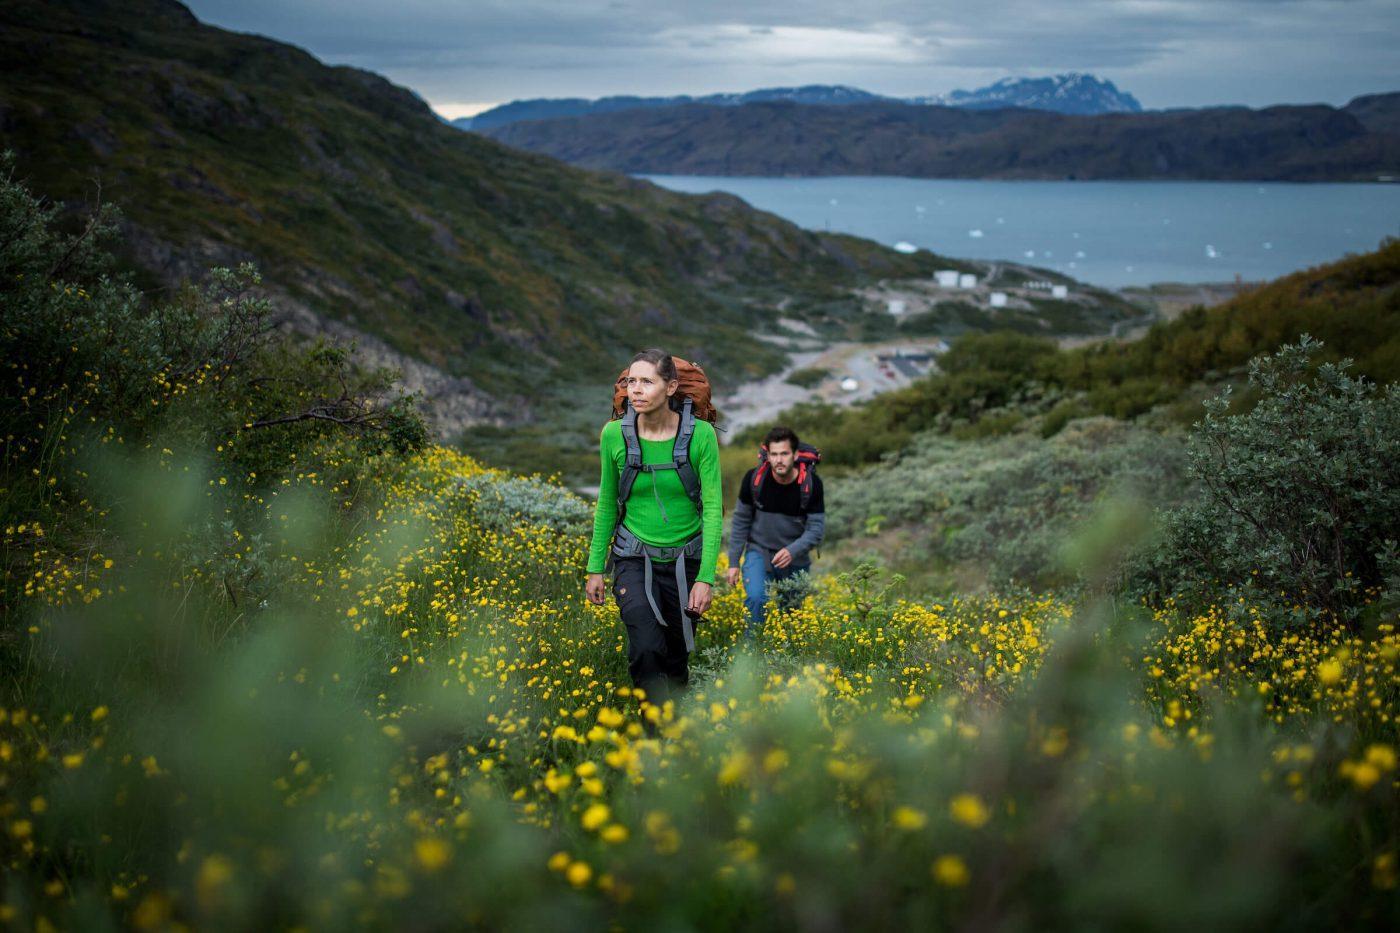 Hiking up through yellow flowers in Narsarsuaq. By Mads Pihl